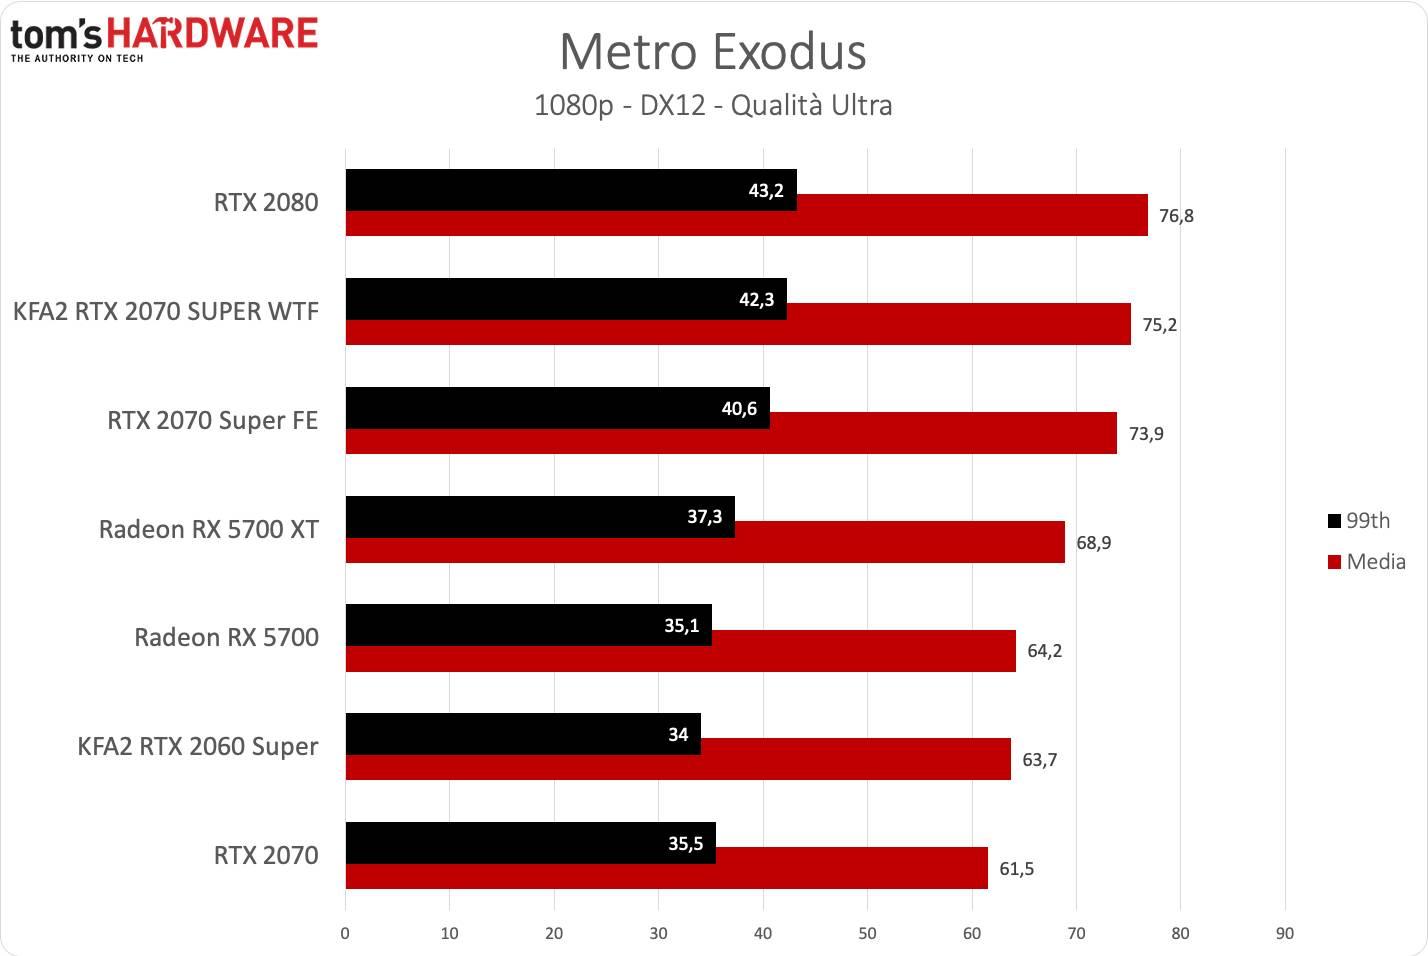 KFA2 RTX 2070 SUPER WTF - Metro FHD